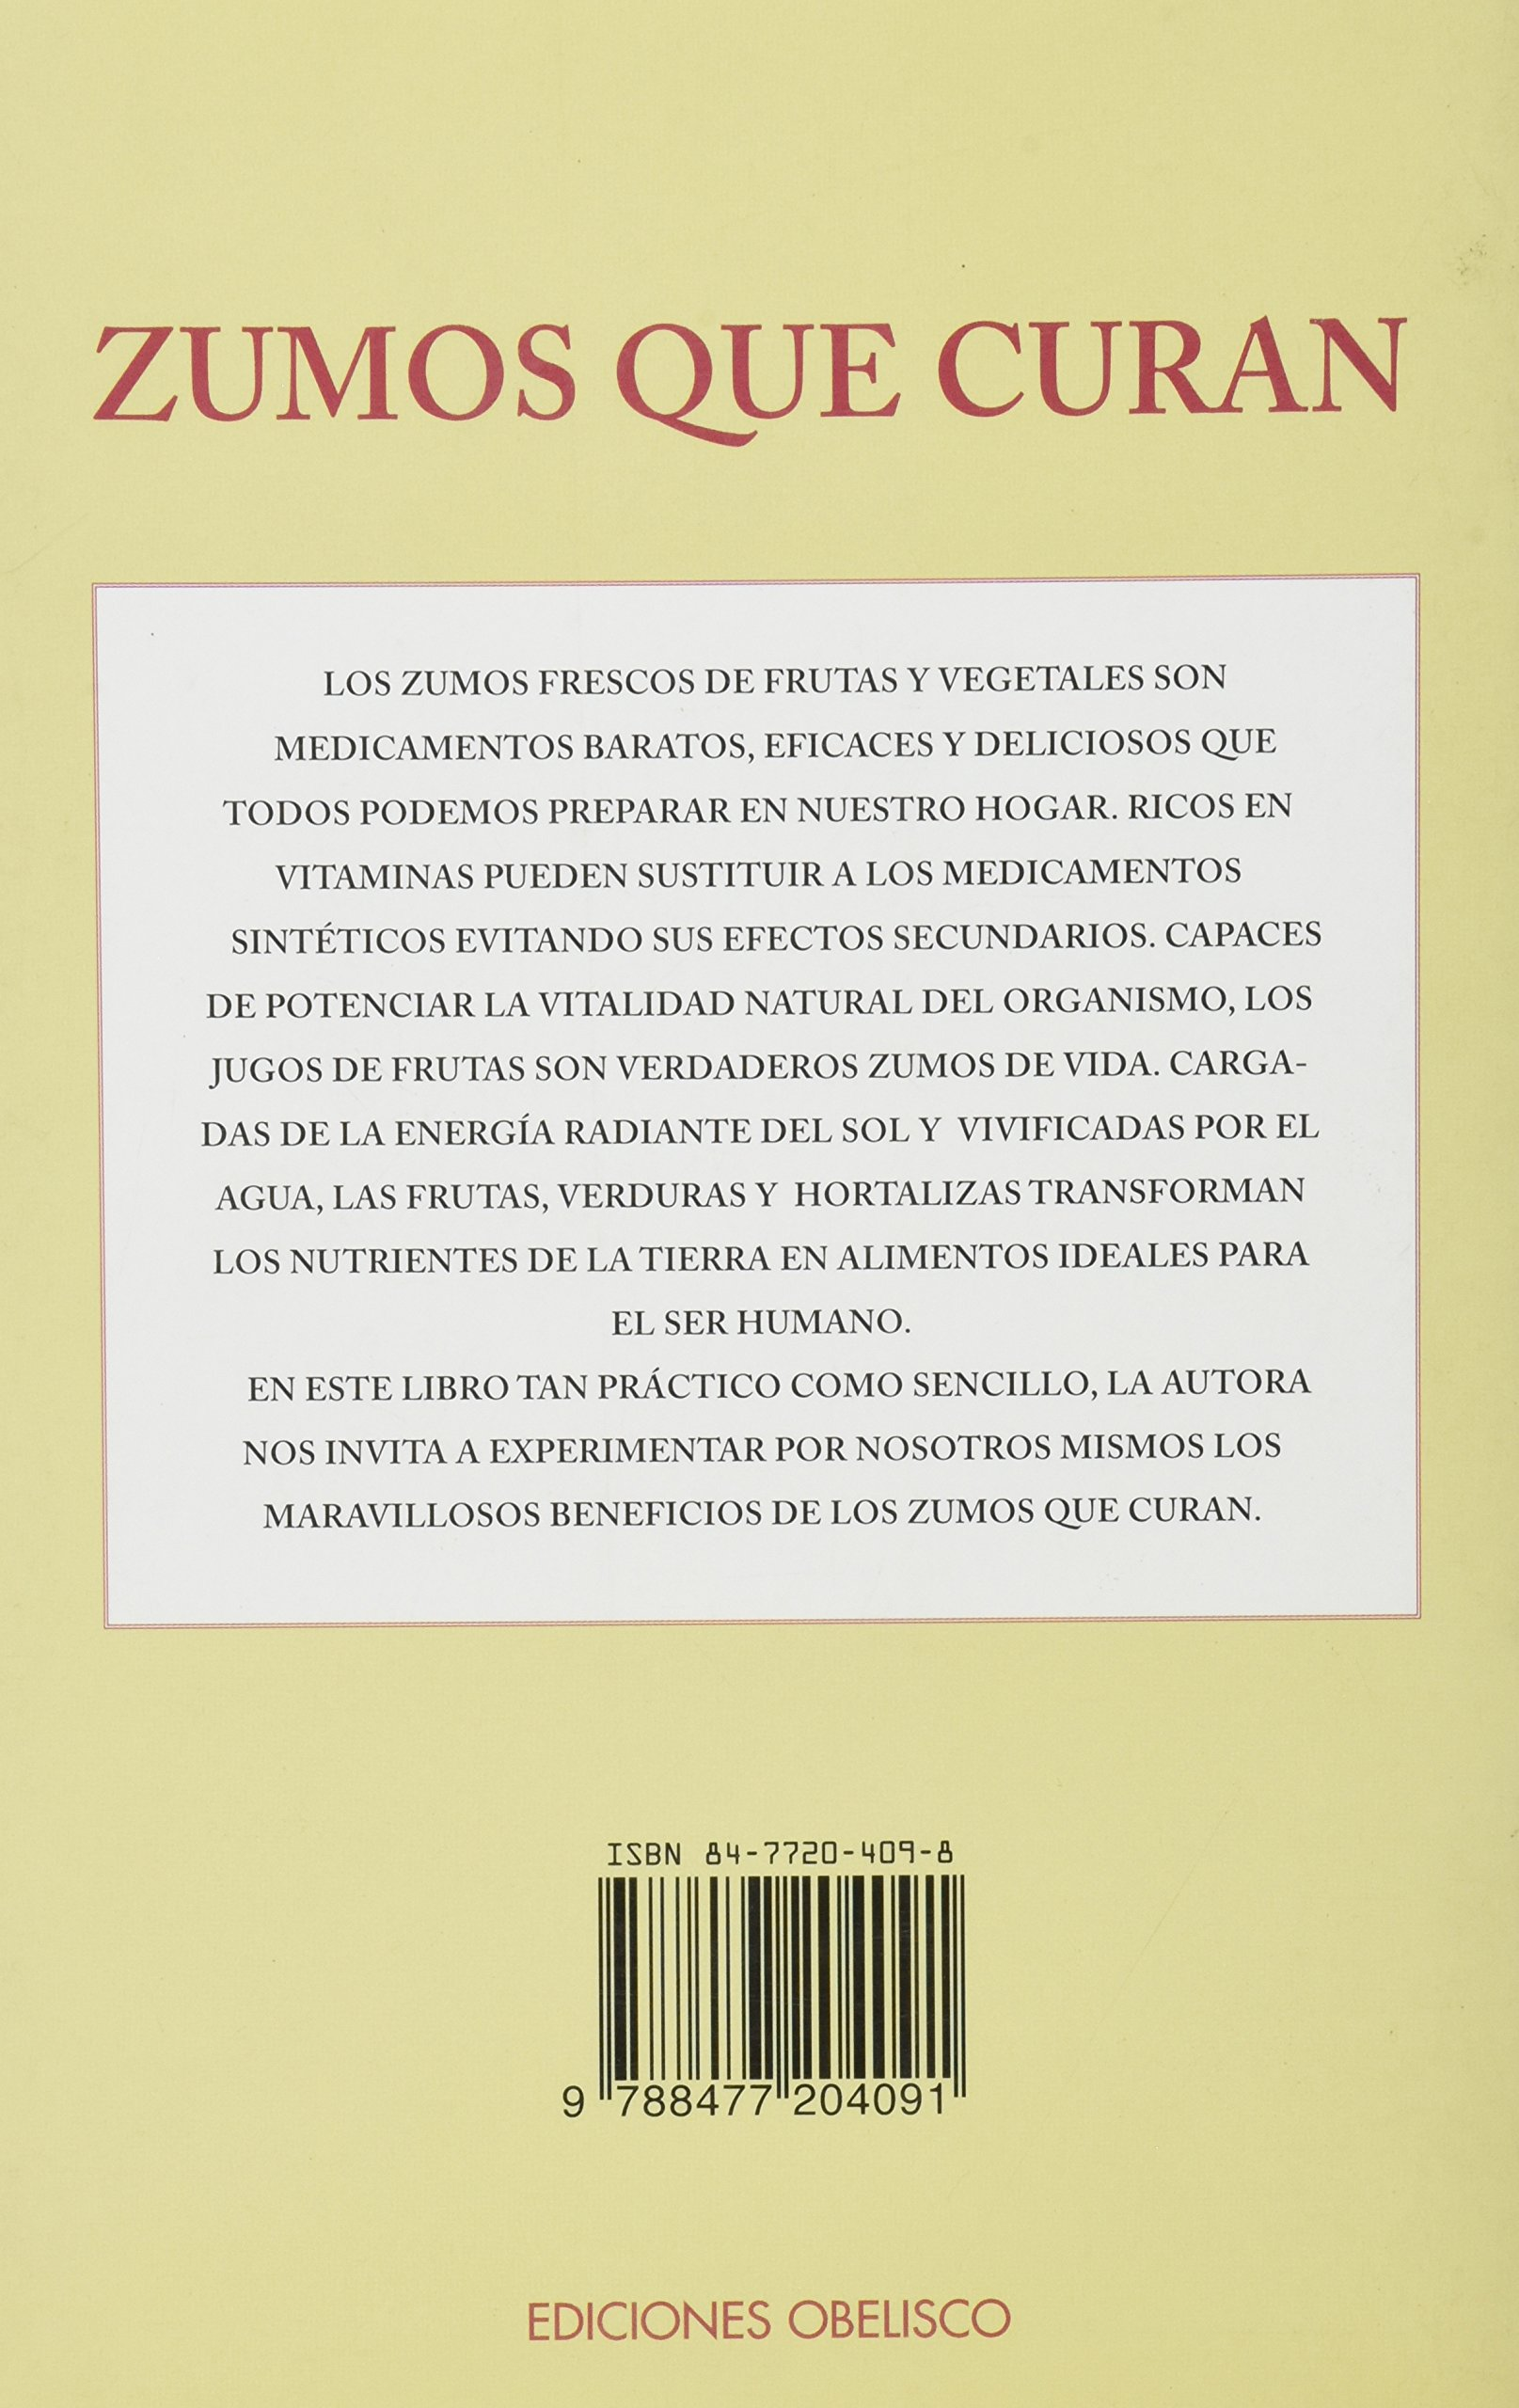 Zumos Que Curan / Curing Juices (Salud Y Vida Natural / Natural Health and Living) (Spanish Edition): Sarah Williams: 9788477204091: Amazon.com: Books